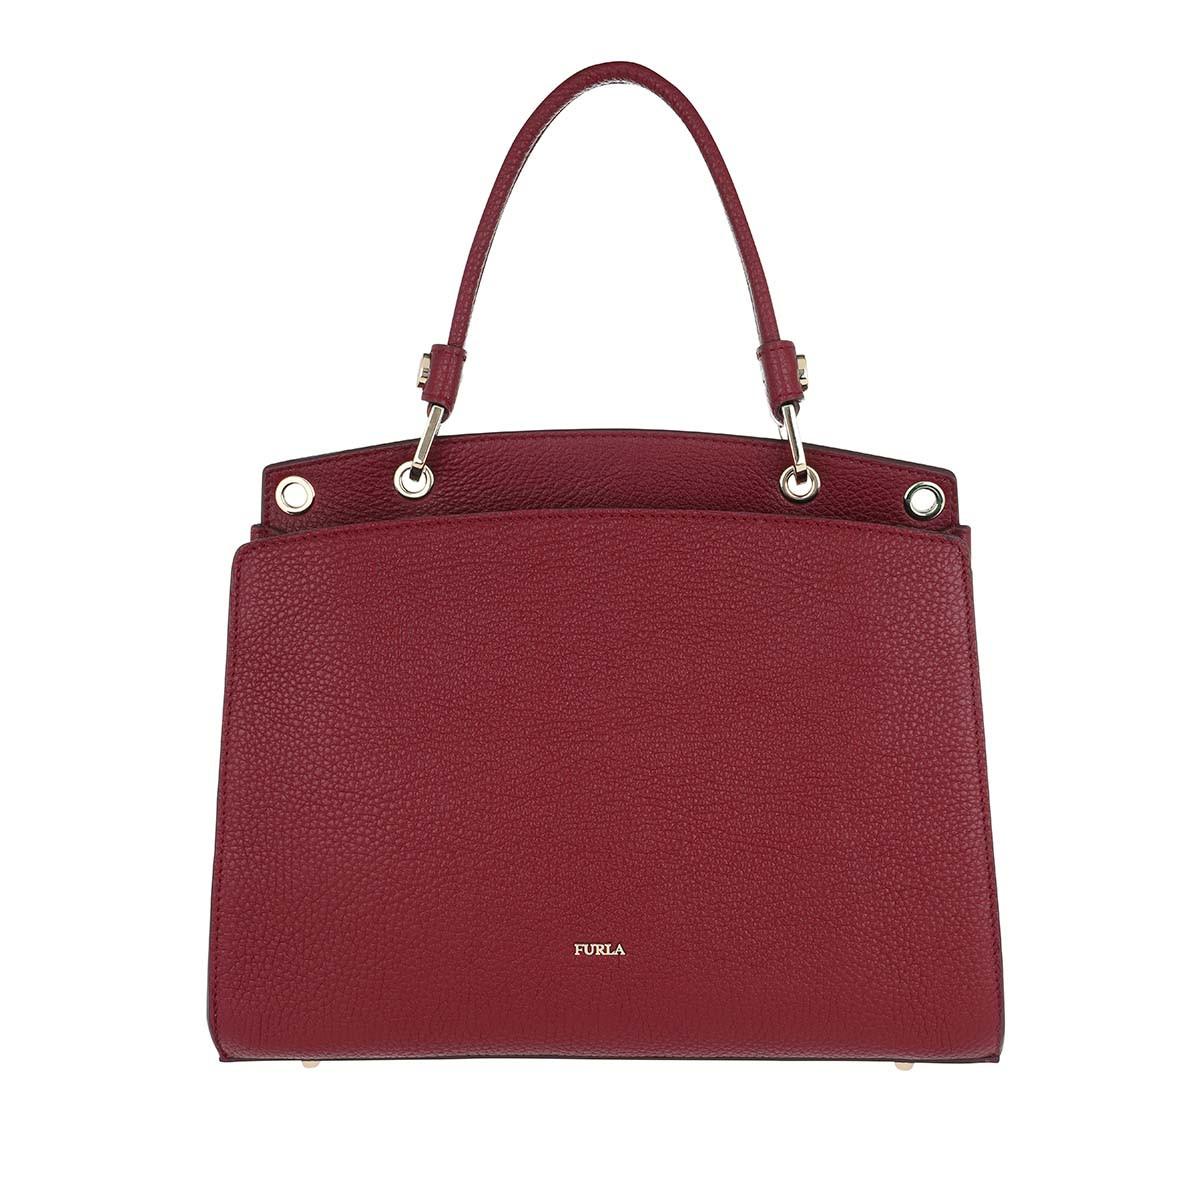 Furla Satchel Bag - Adele M Top Handle Bag Ciliegia - in rot - für Damen